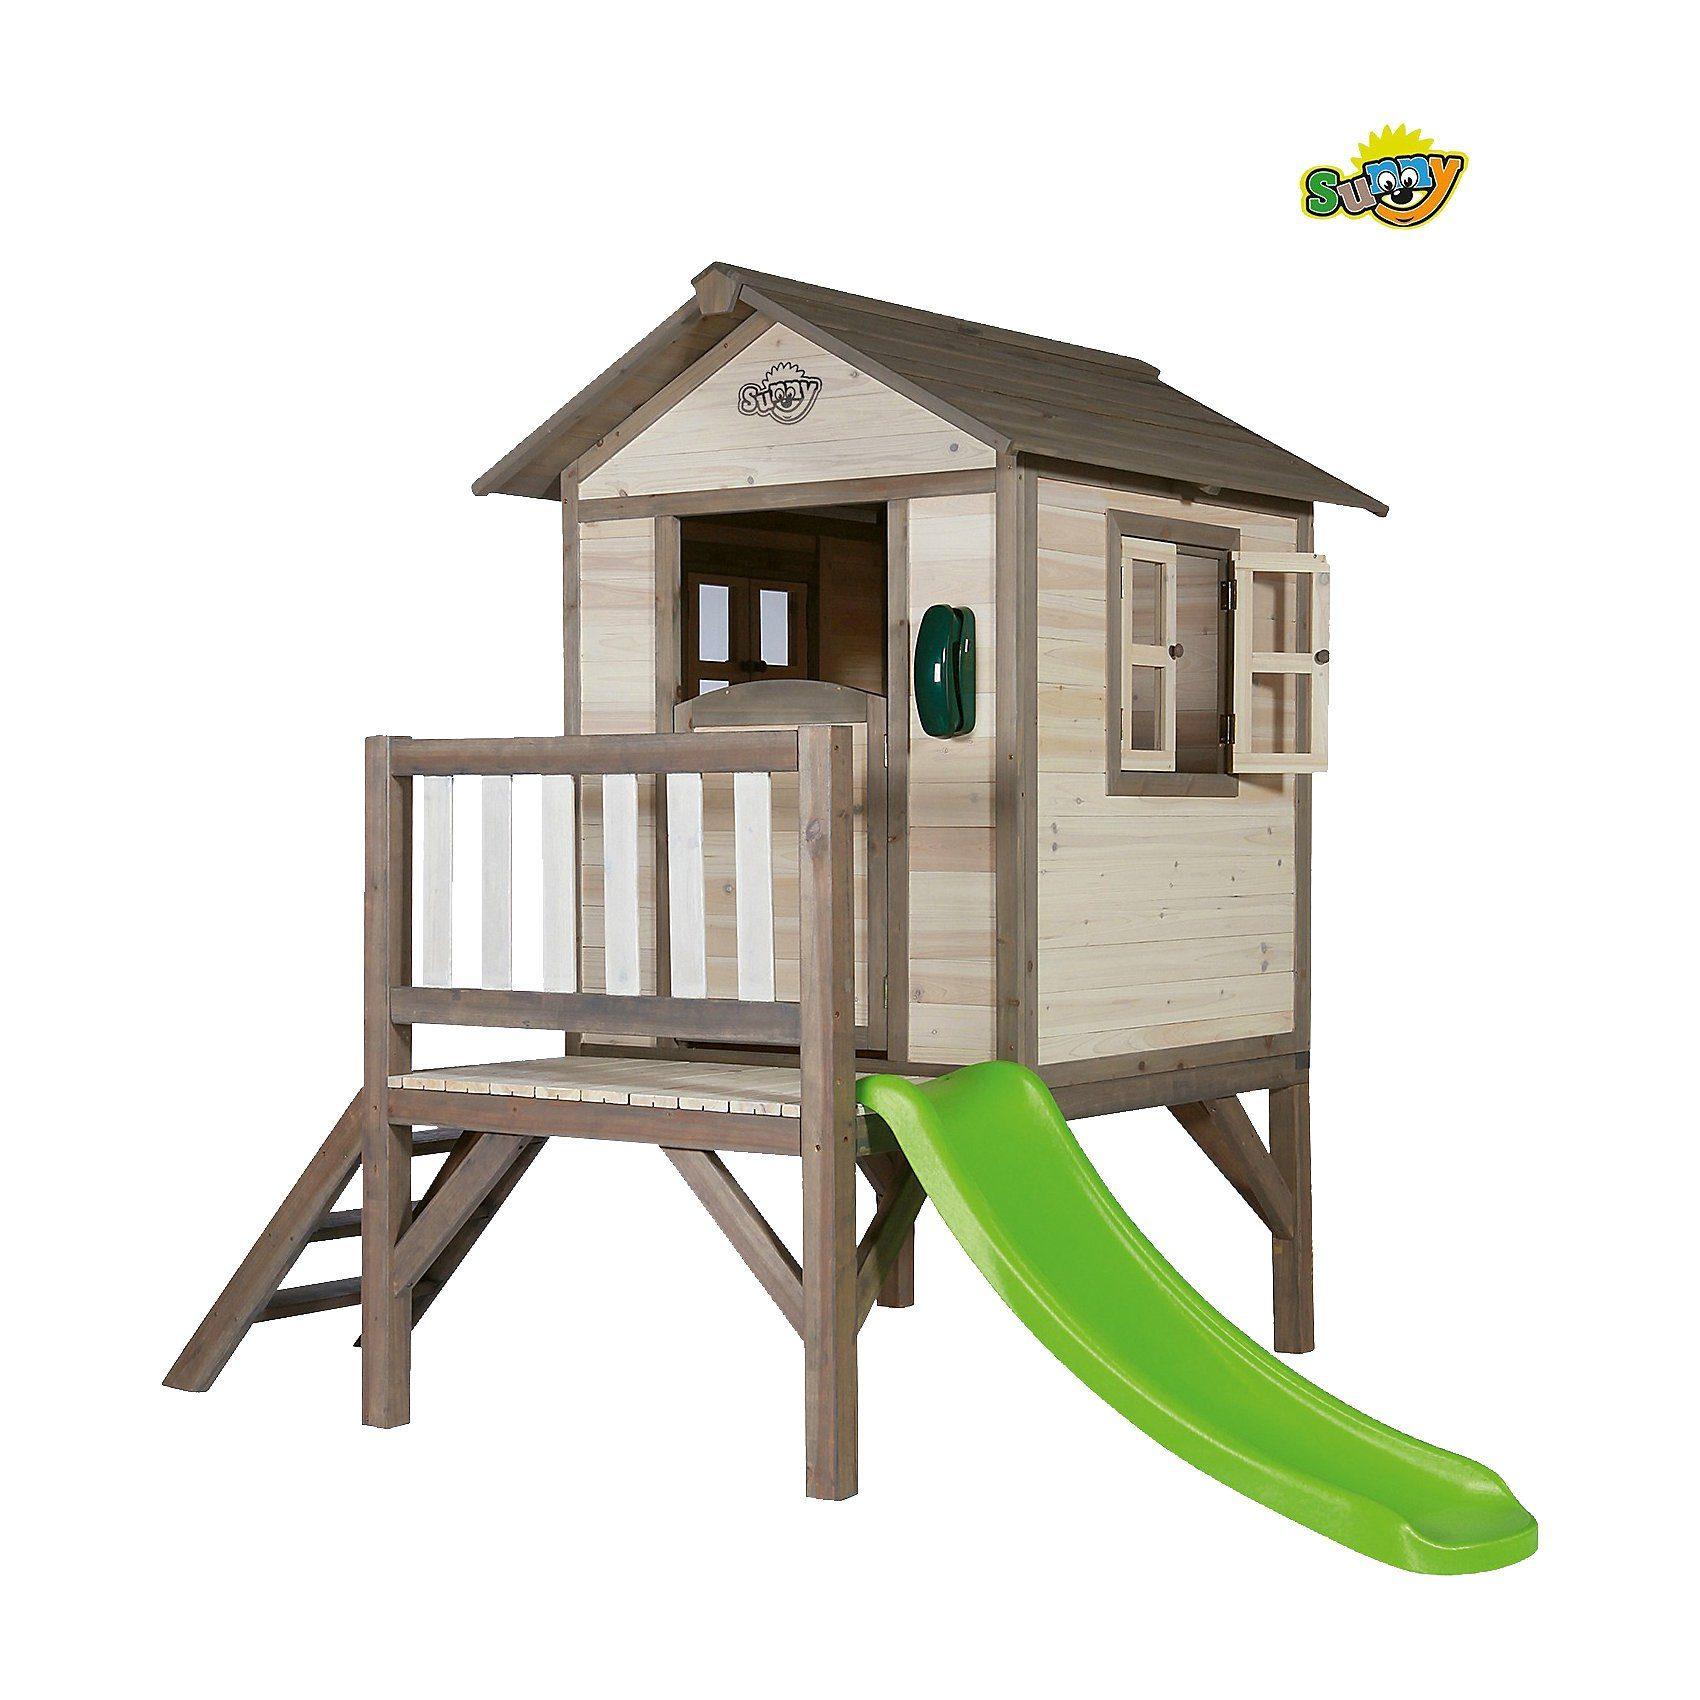 Sunny Spielhaus Lodge XL